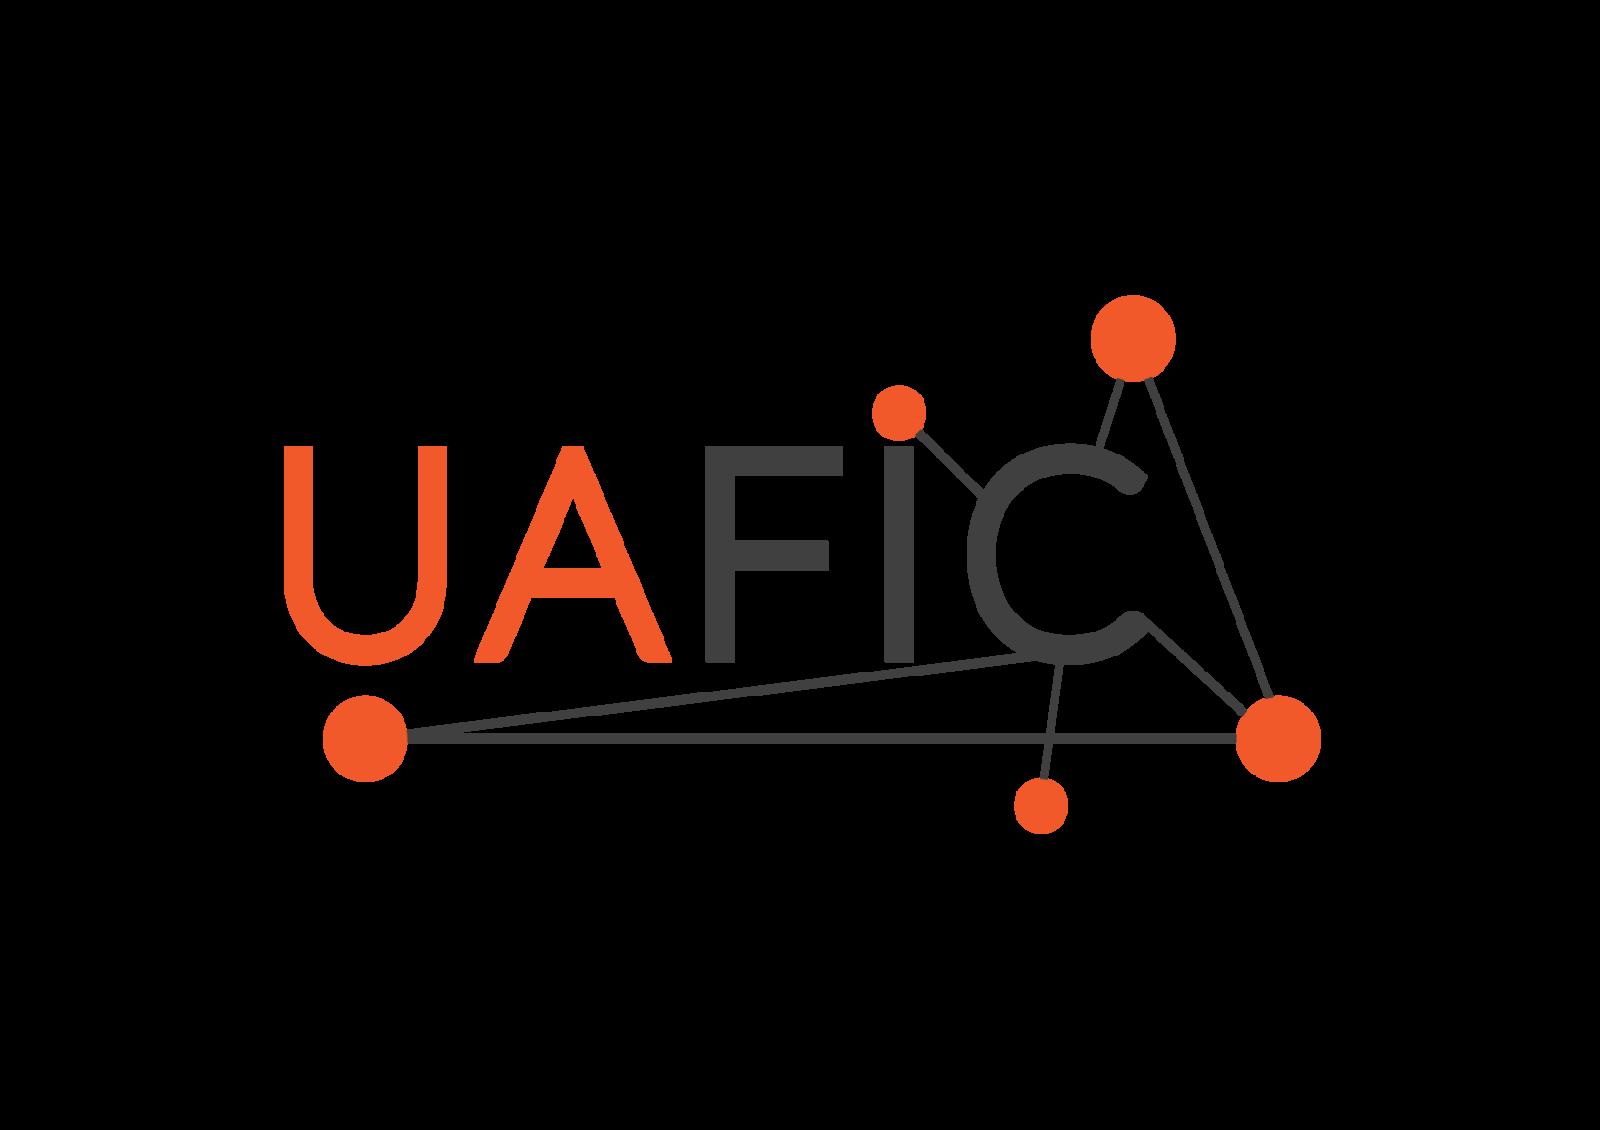 UAFIC_1